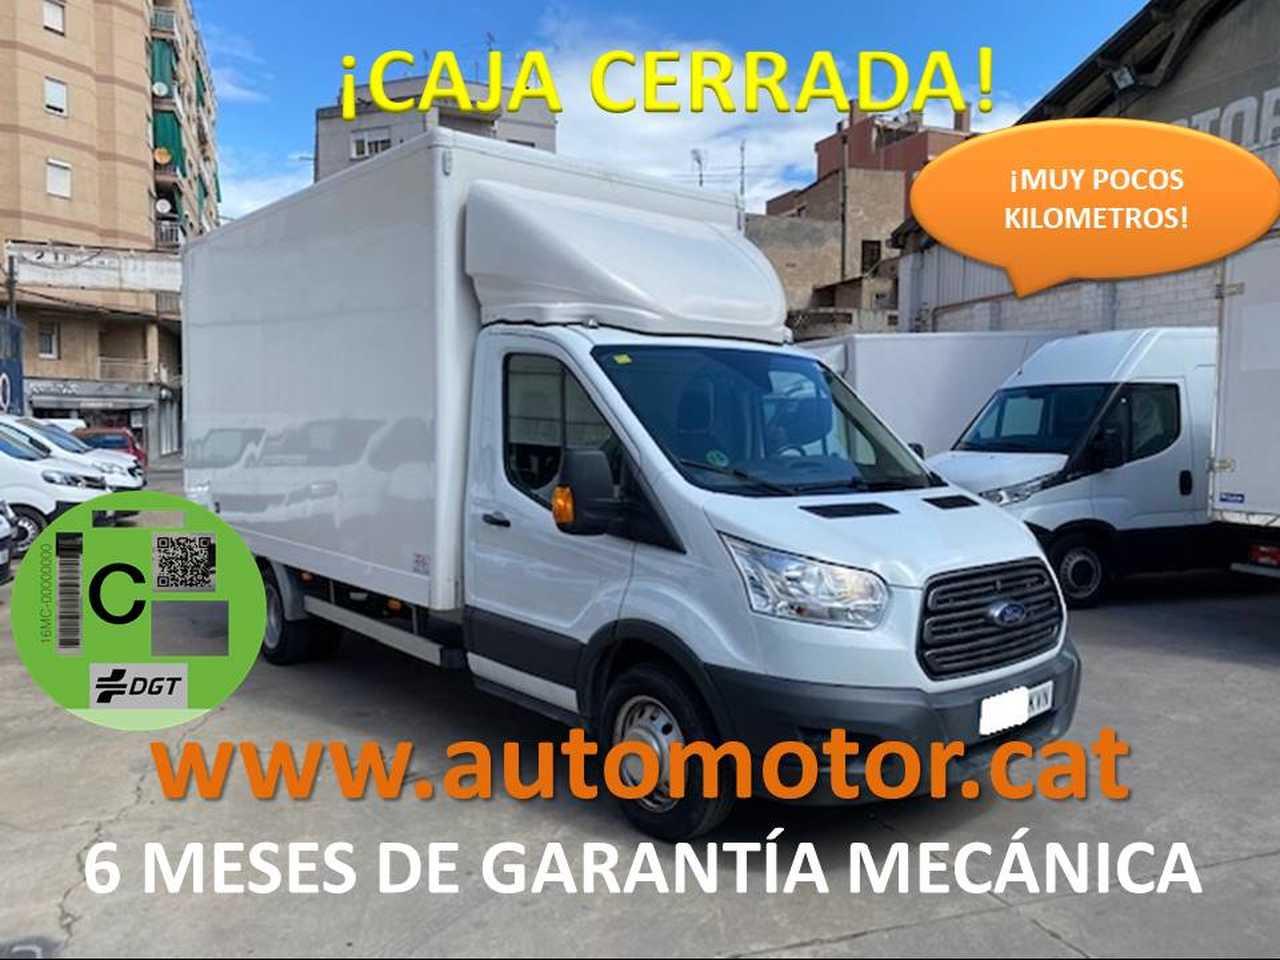 Ford Transit FT 350 L3 Chasis Trend 170 - GARANTIA MECANICA  - Foto 1